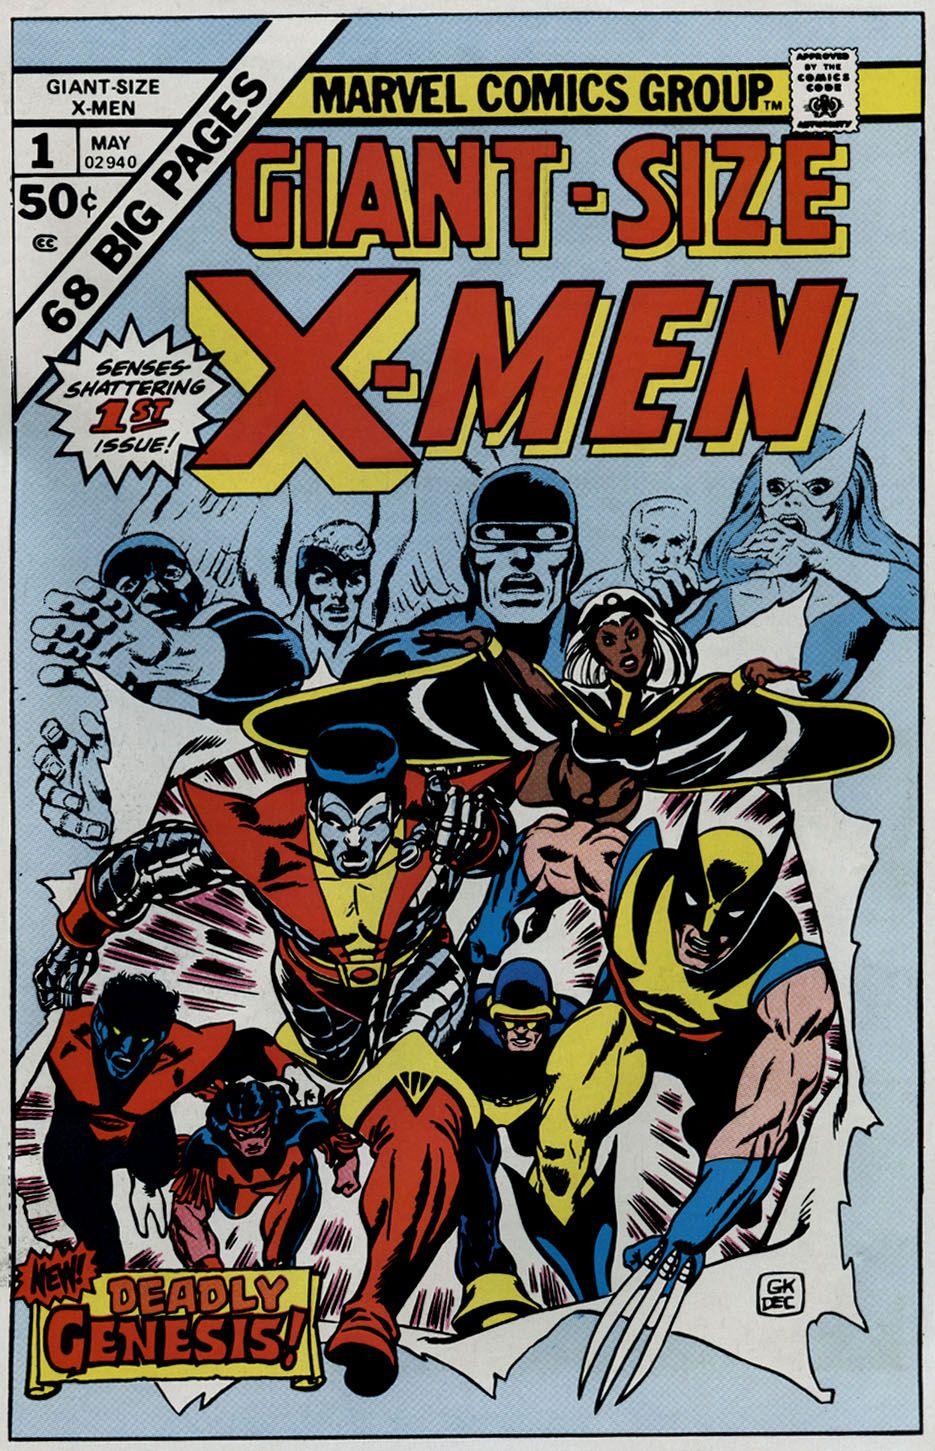 Classic X Men Vol 1 1 Bonus 002 Jpg 935 1451 Marvel Comic Books Comic Book Covers Comic Covers